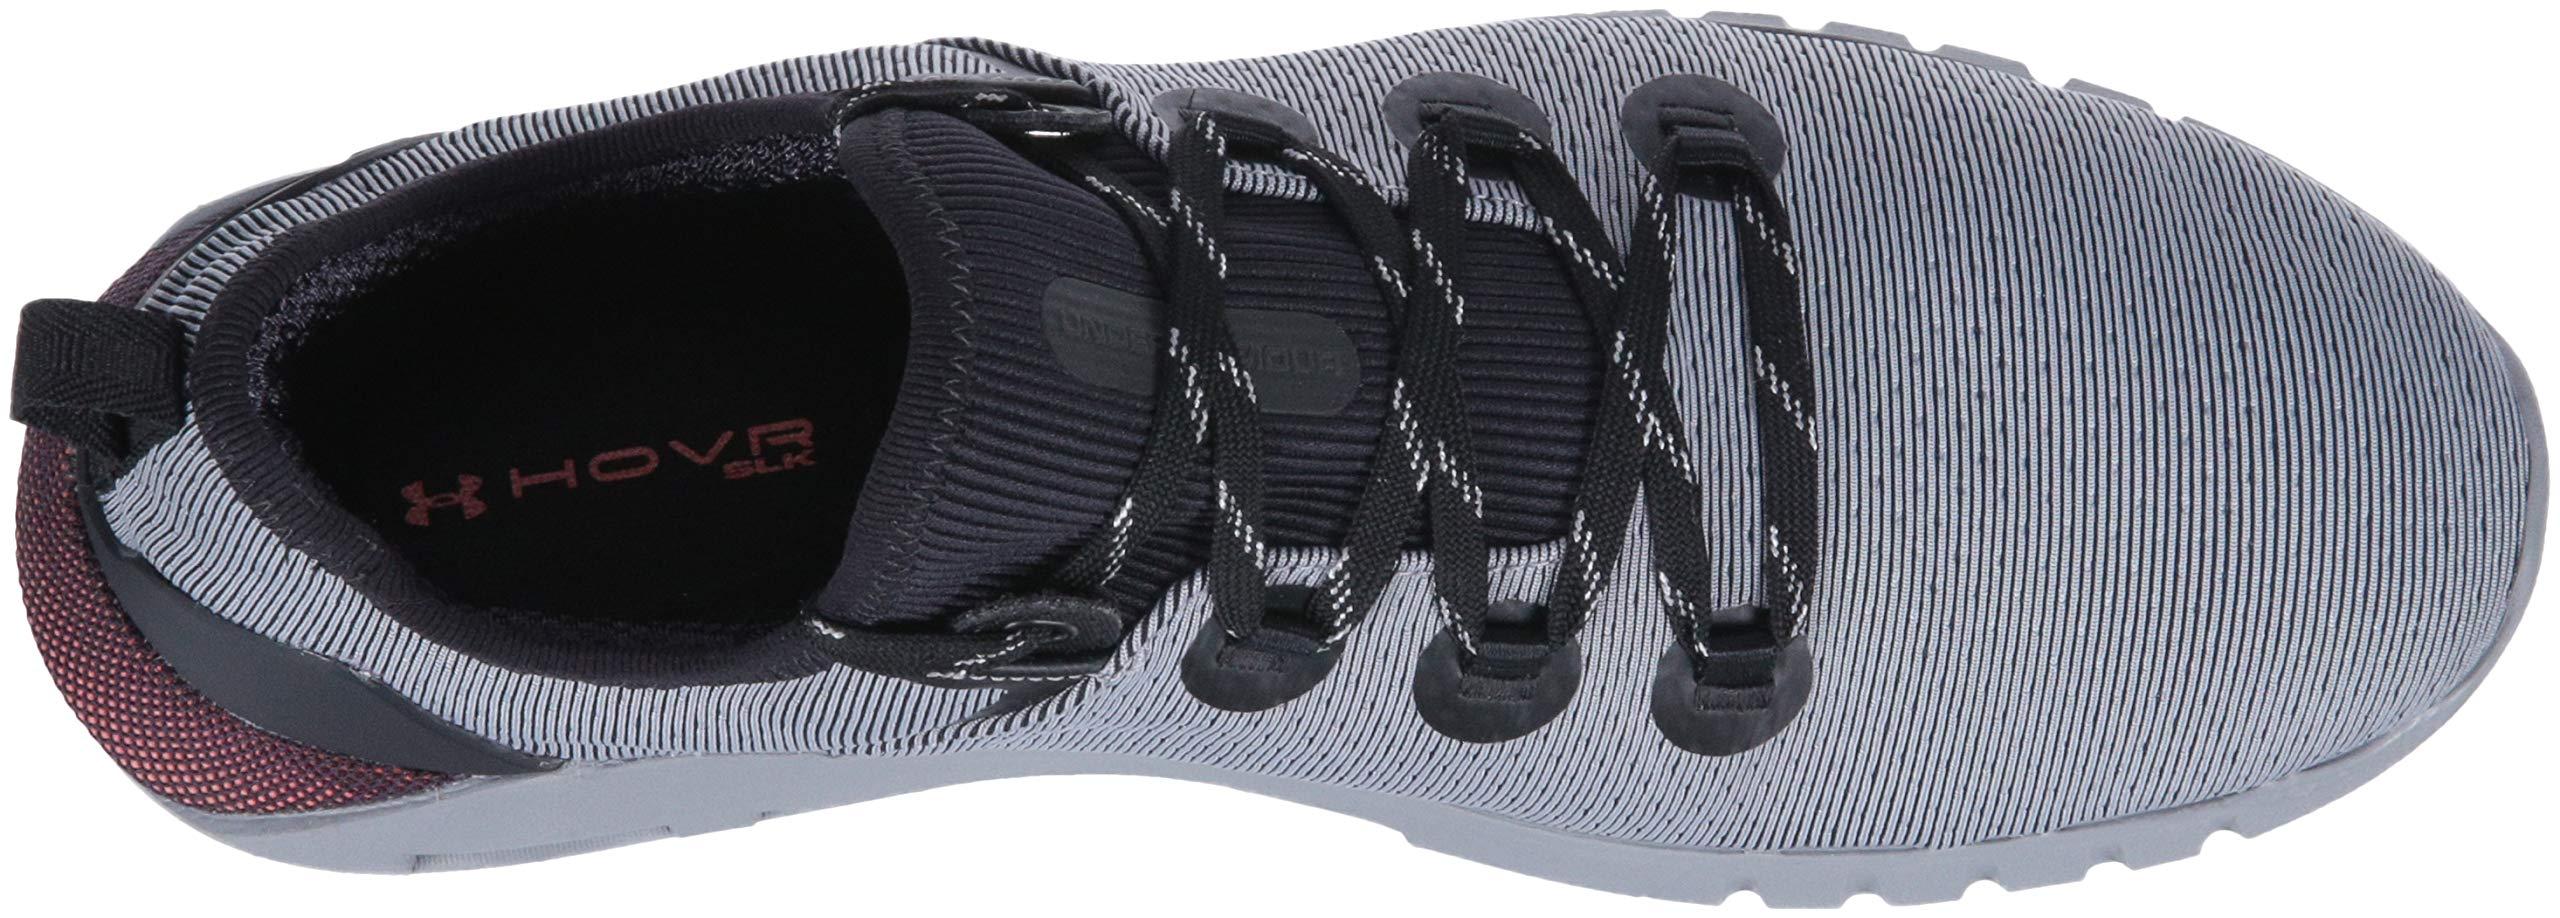 adidas Men's Questar BYD Running Shoe Black/Grey, 6.5 M US by adidas (Image #8)